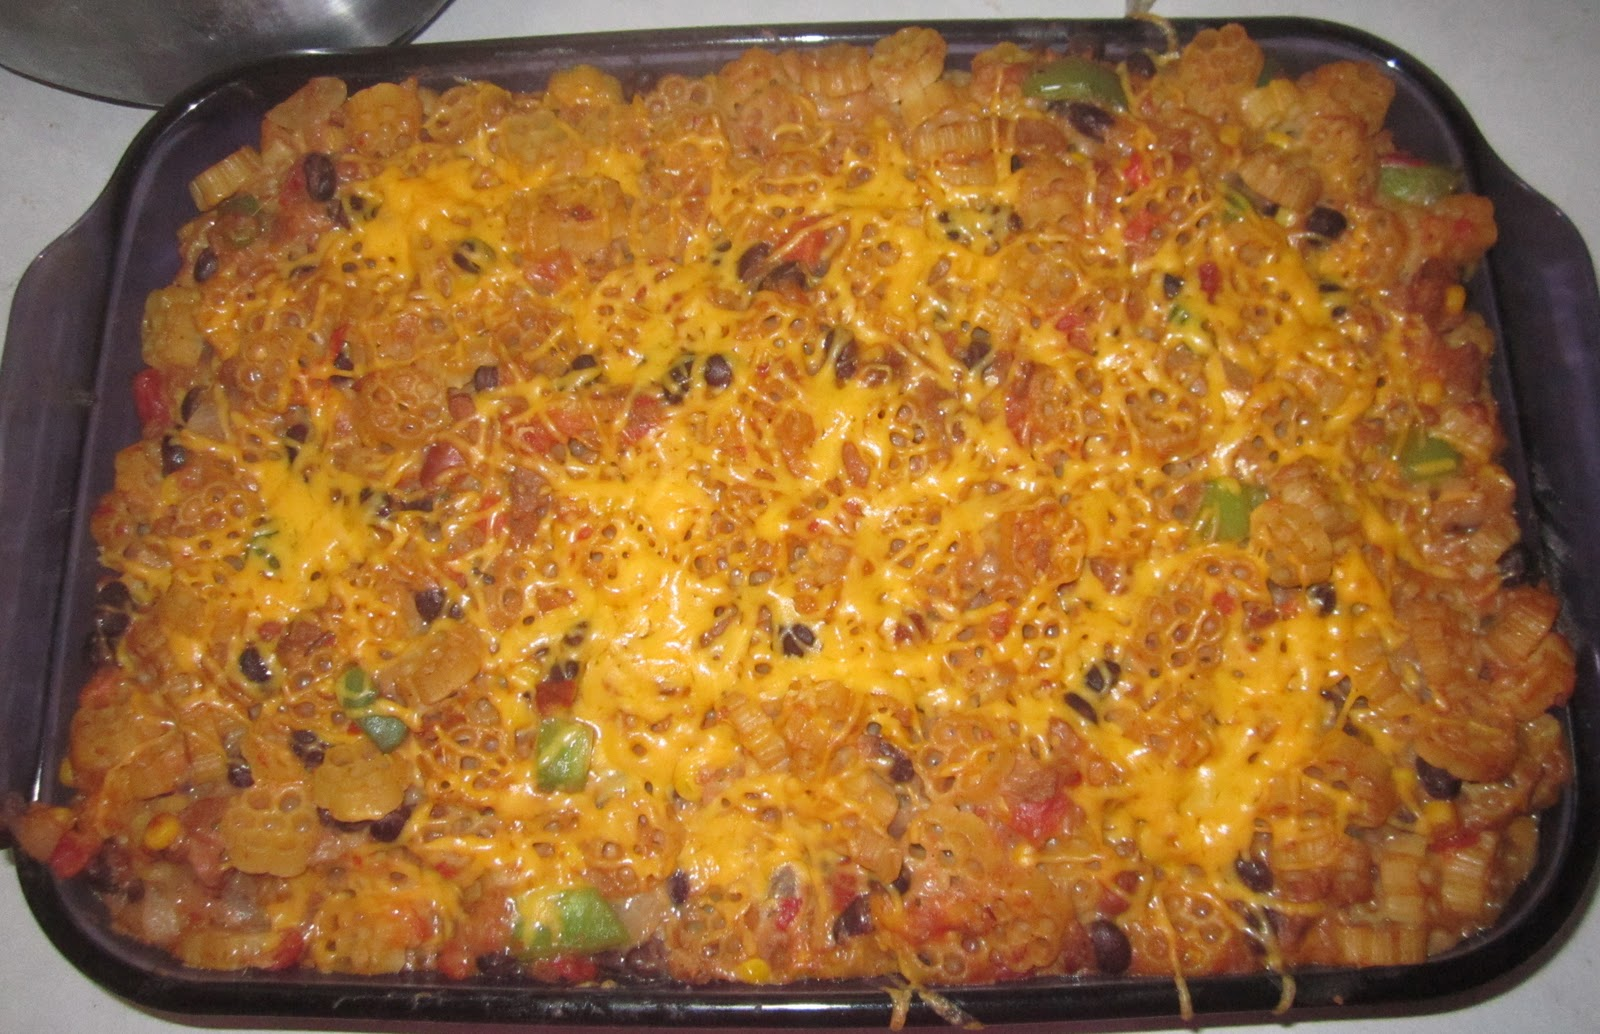 ... Deviled Eggs, Southwestern Casserole, & Vegetarian Beefless Stew